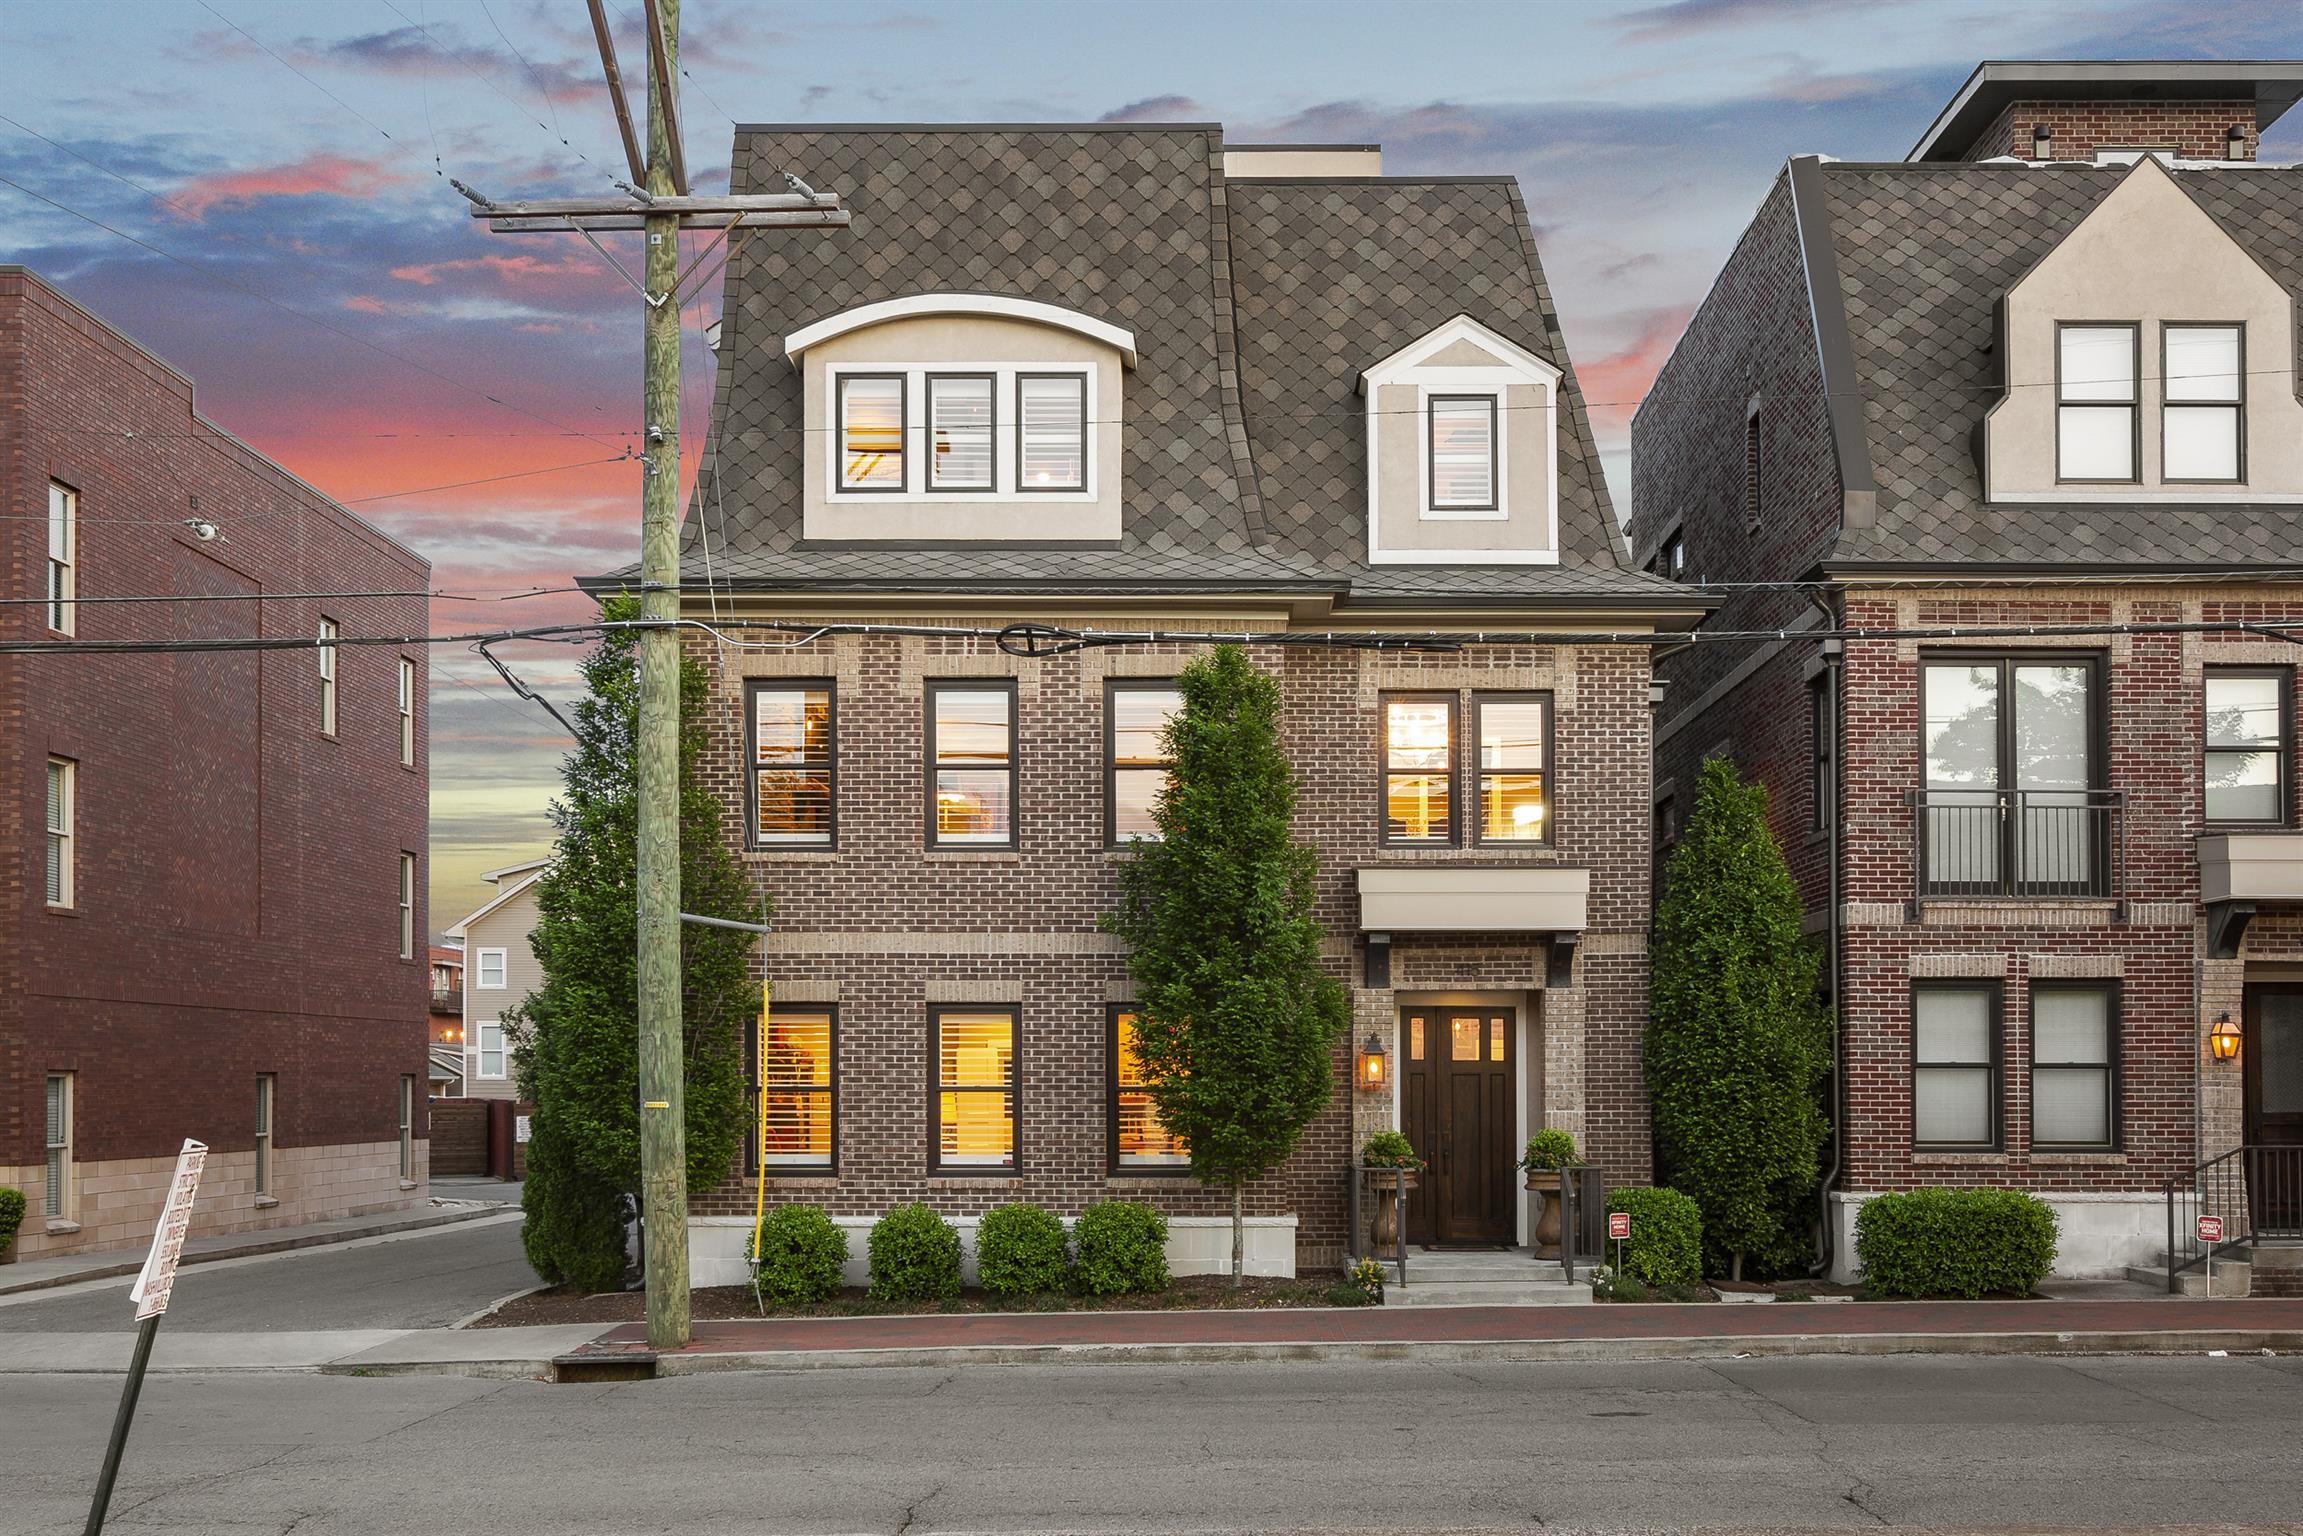 415 Monroe St, Nashville, TN 37208 - Nashville, TN real estate listing